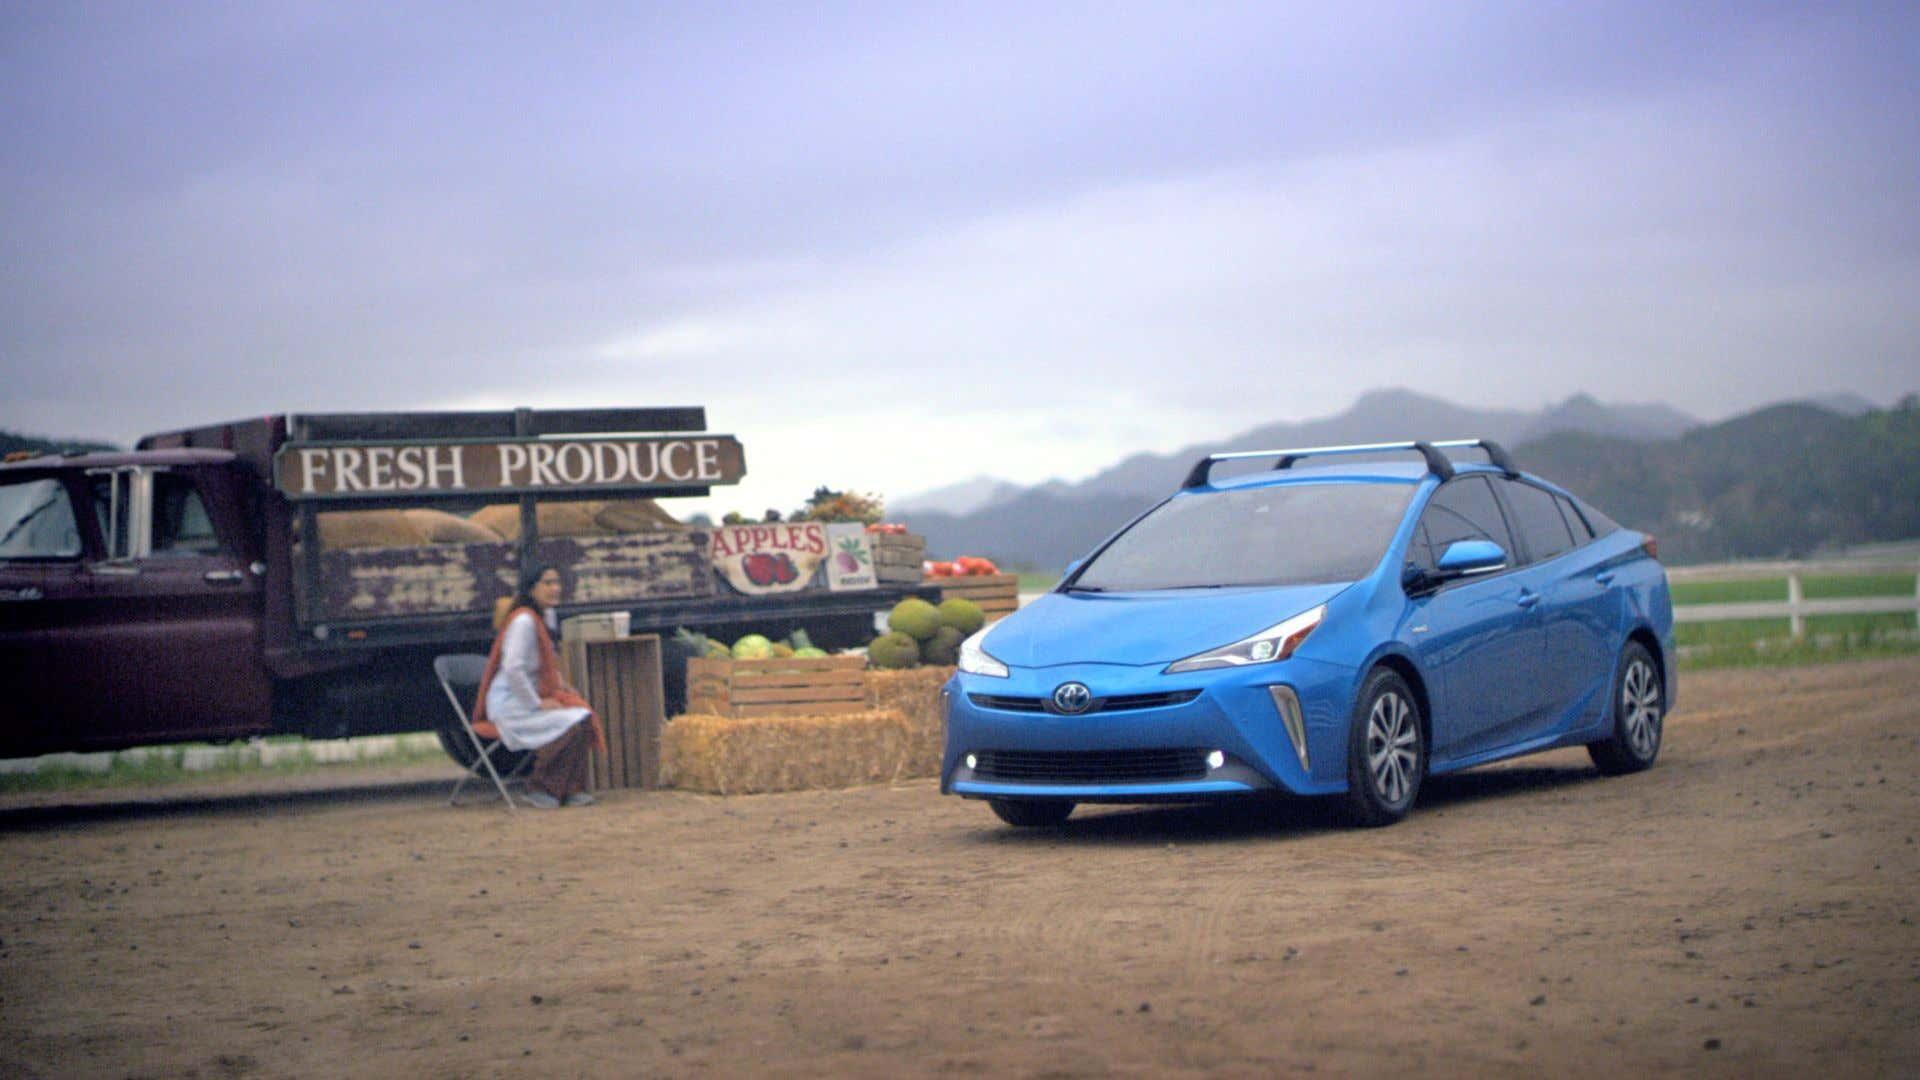 The OG Hybrid, the Toyota Prius.